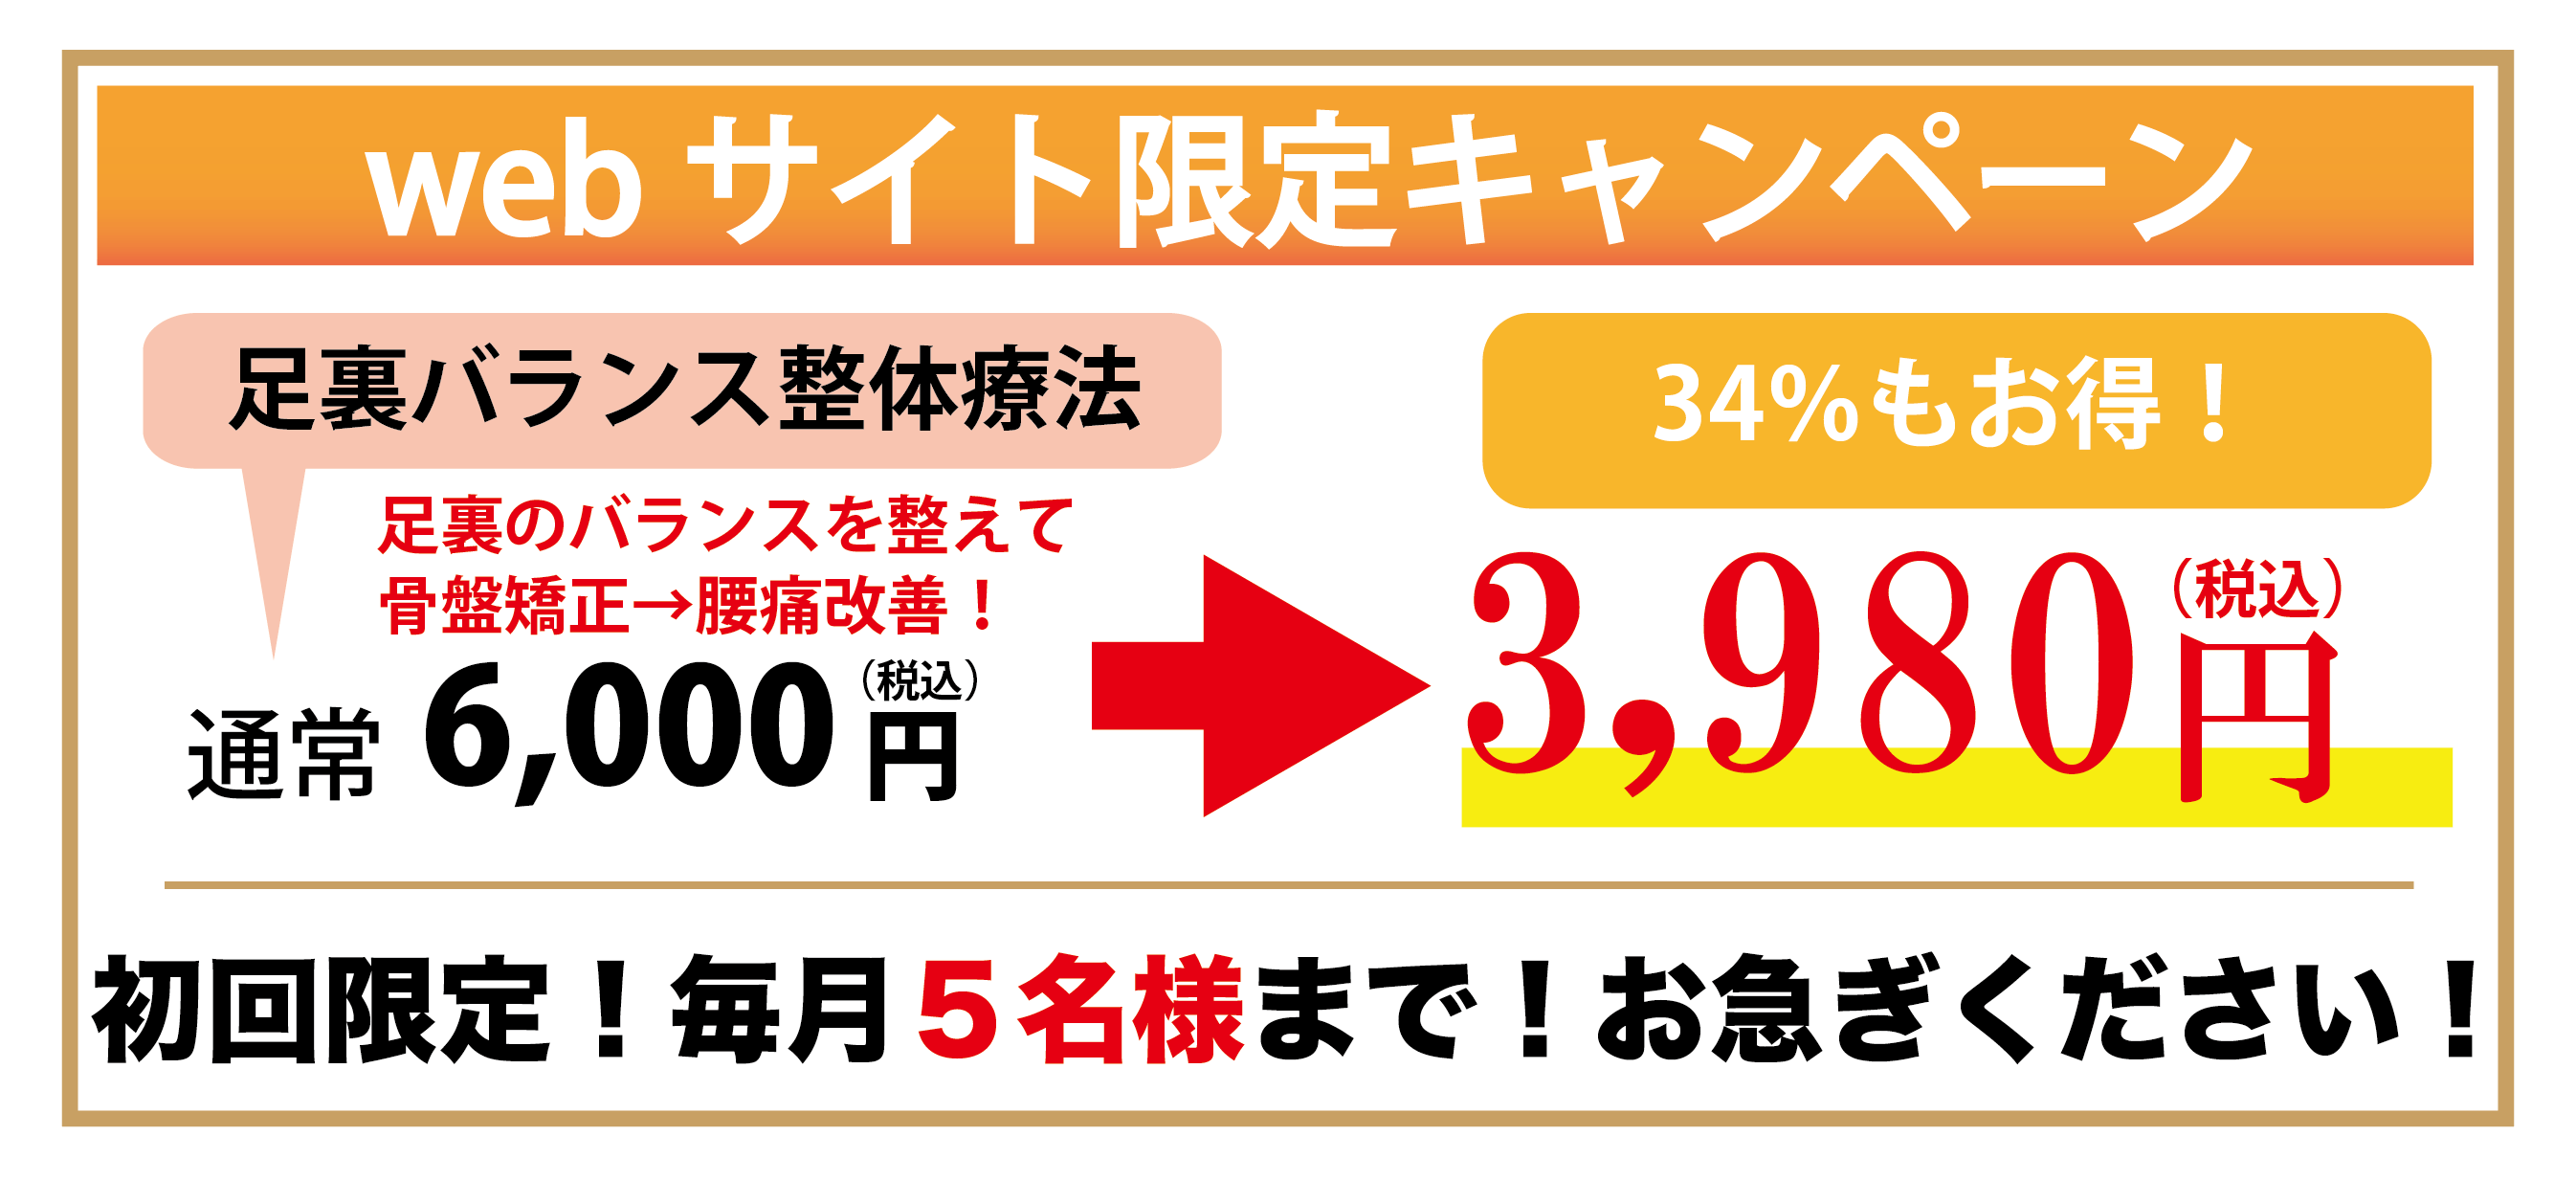 Webサイト限定キャンペーン 骨盤矯正で腰痛改善 1980円! 初回限定! 1日3名まで!お急ぎください!